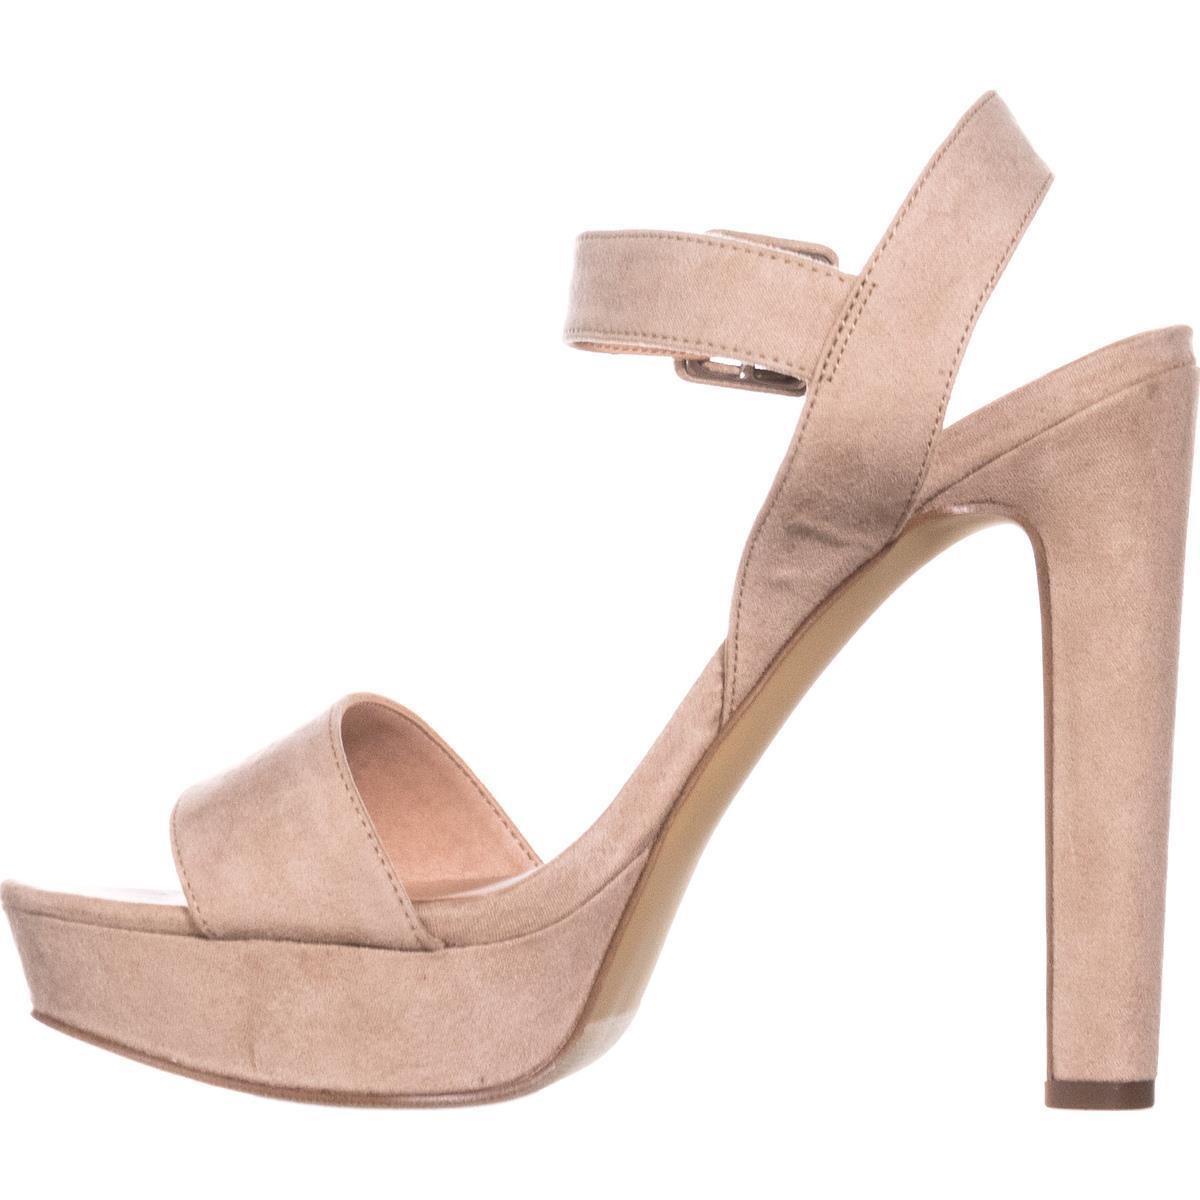 7aa89e1849e1 Lyst - Madden Girl Rollo Heeled Sandals